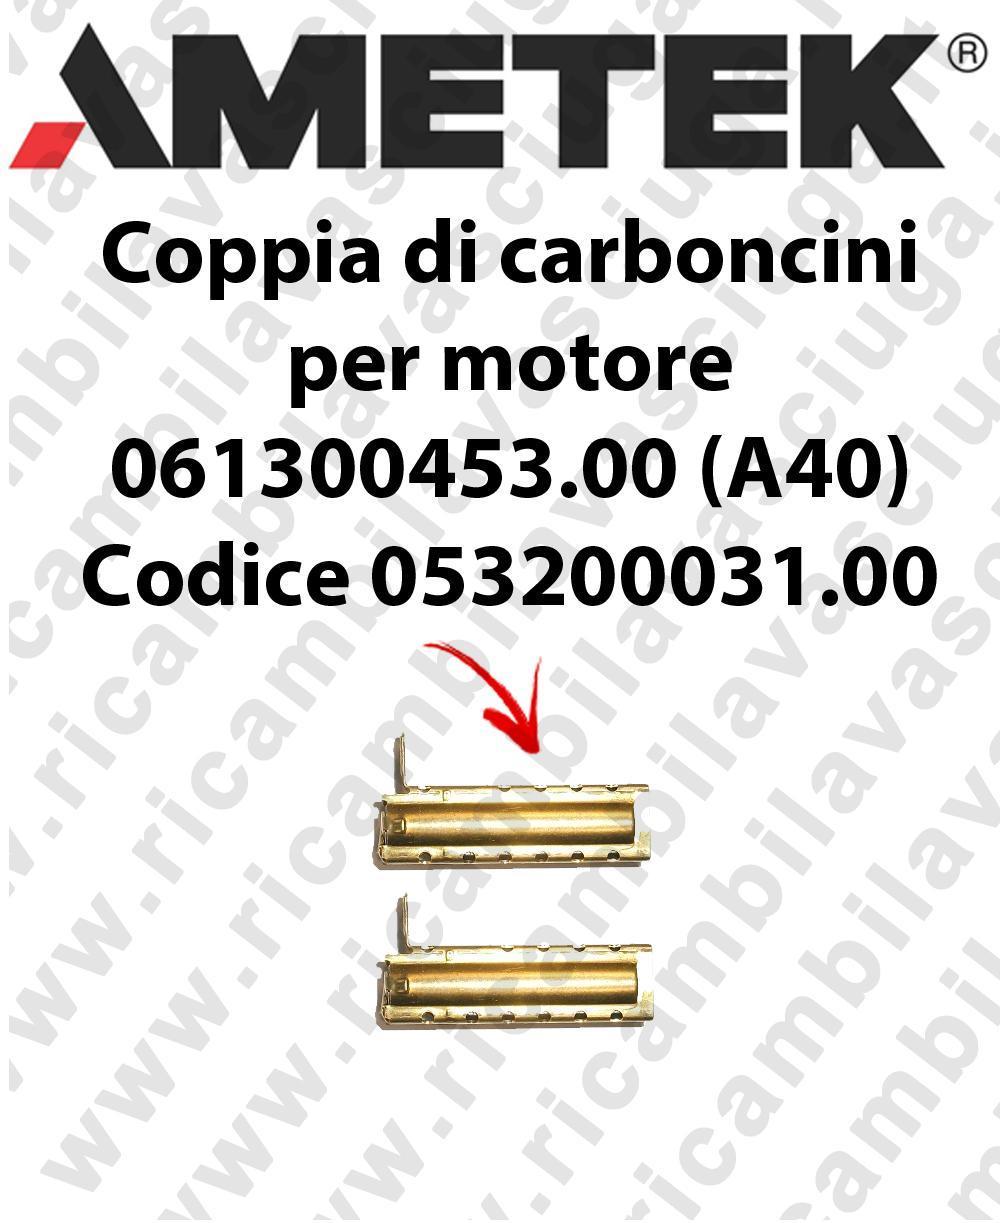 Coupled carbon brush motor for Ametek Vacuum Motor 061300453.00 (A40) Cod: 053200031.00